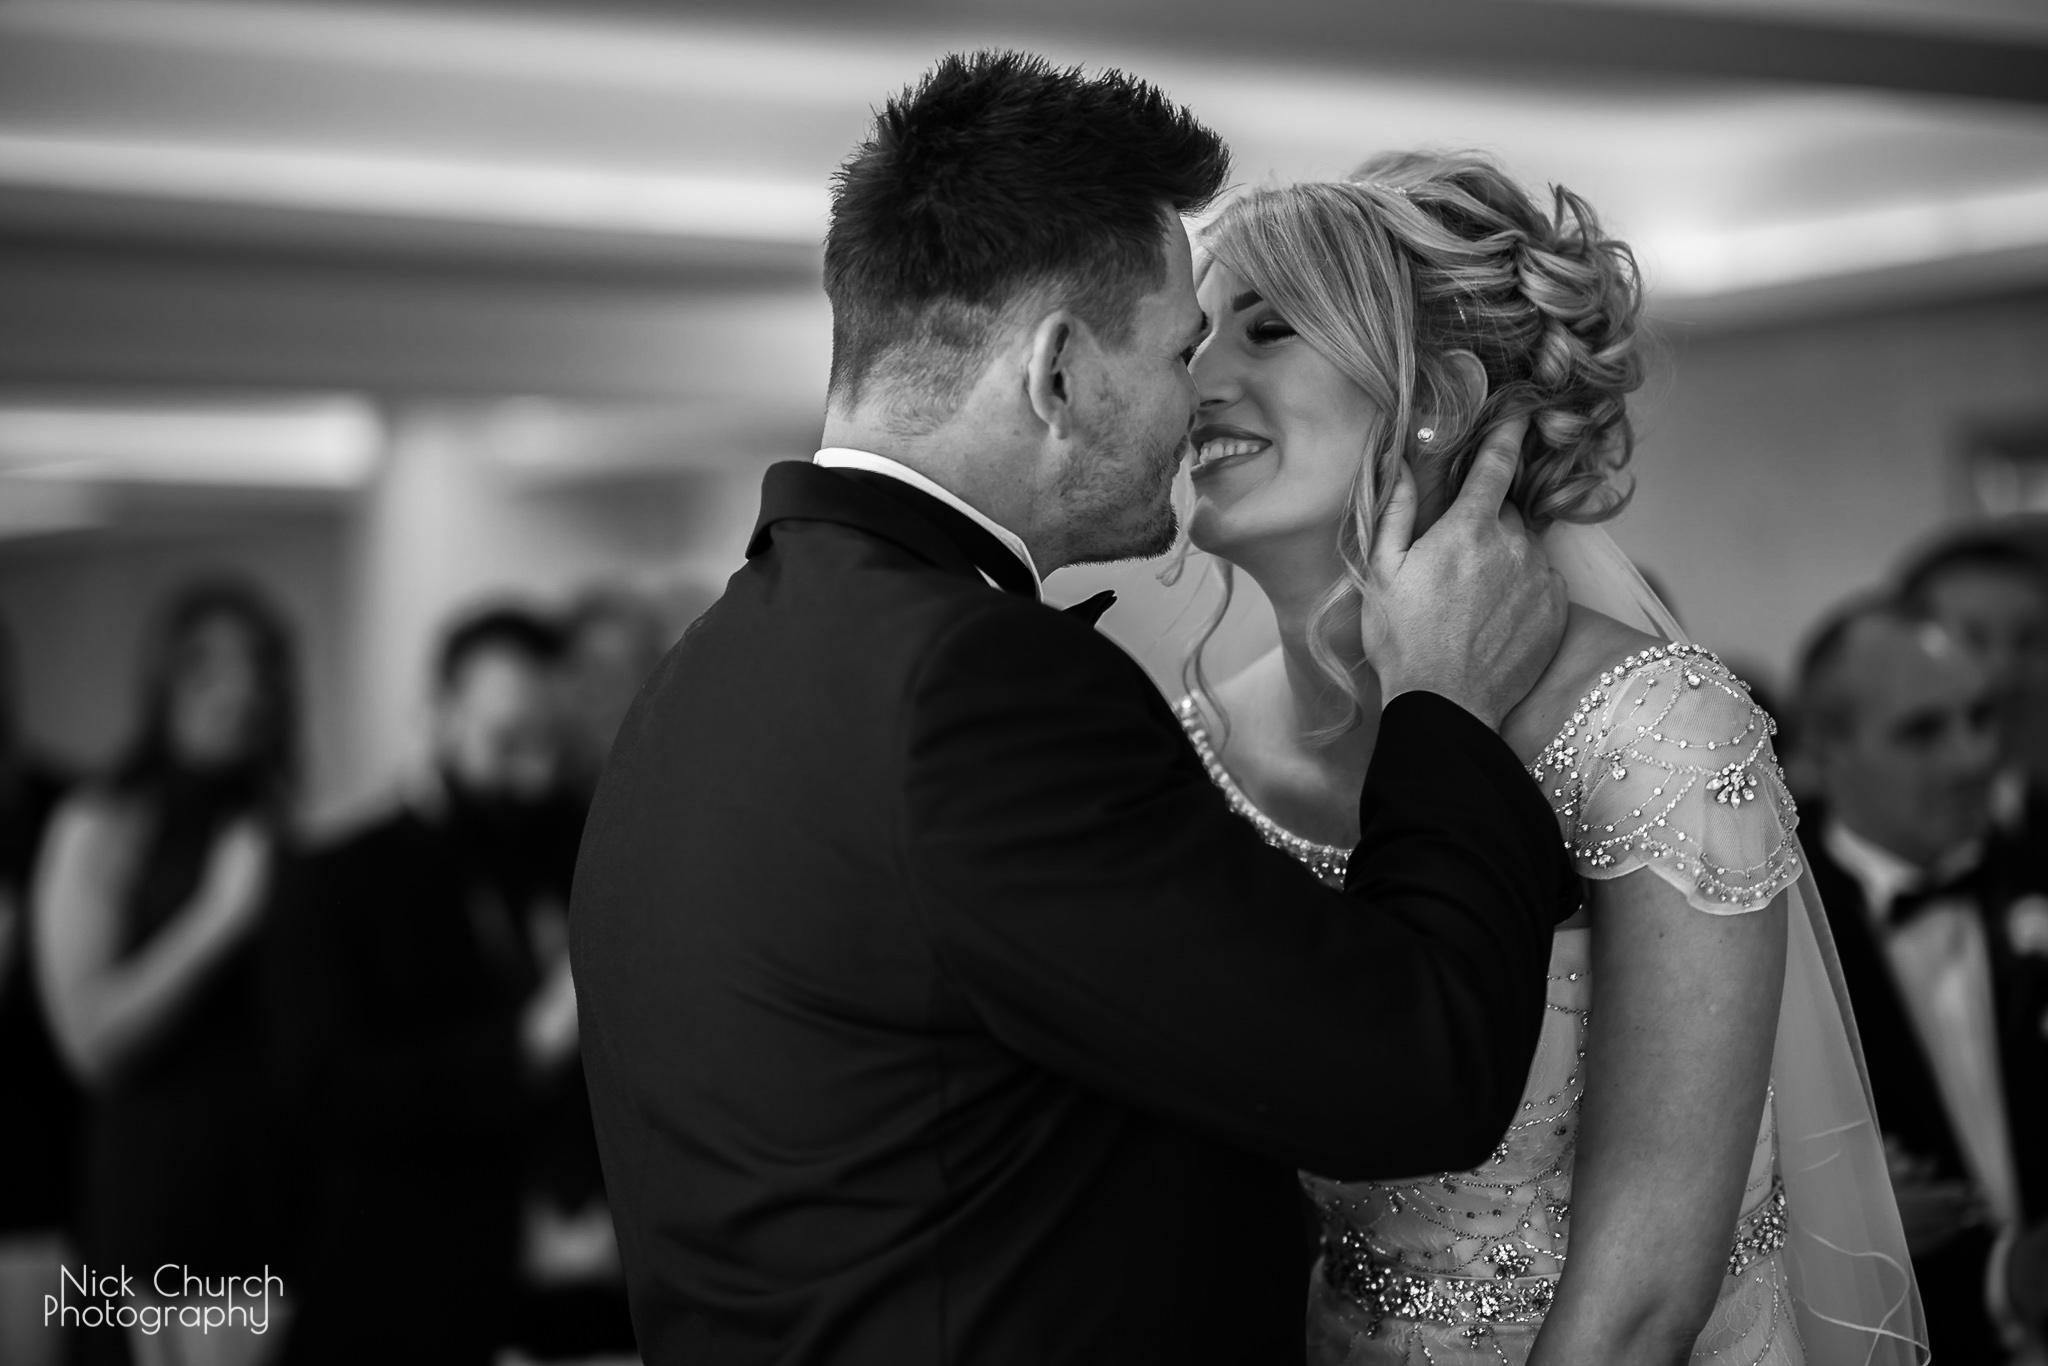 NC-20180317-stacy-and-mike-wedding-0599.jpg